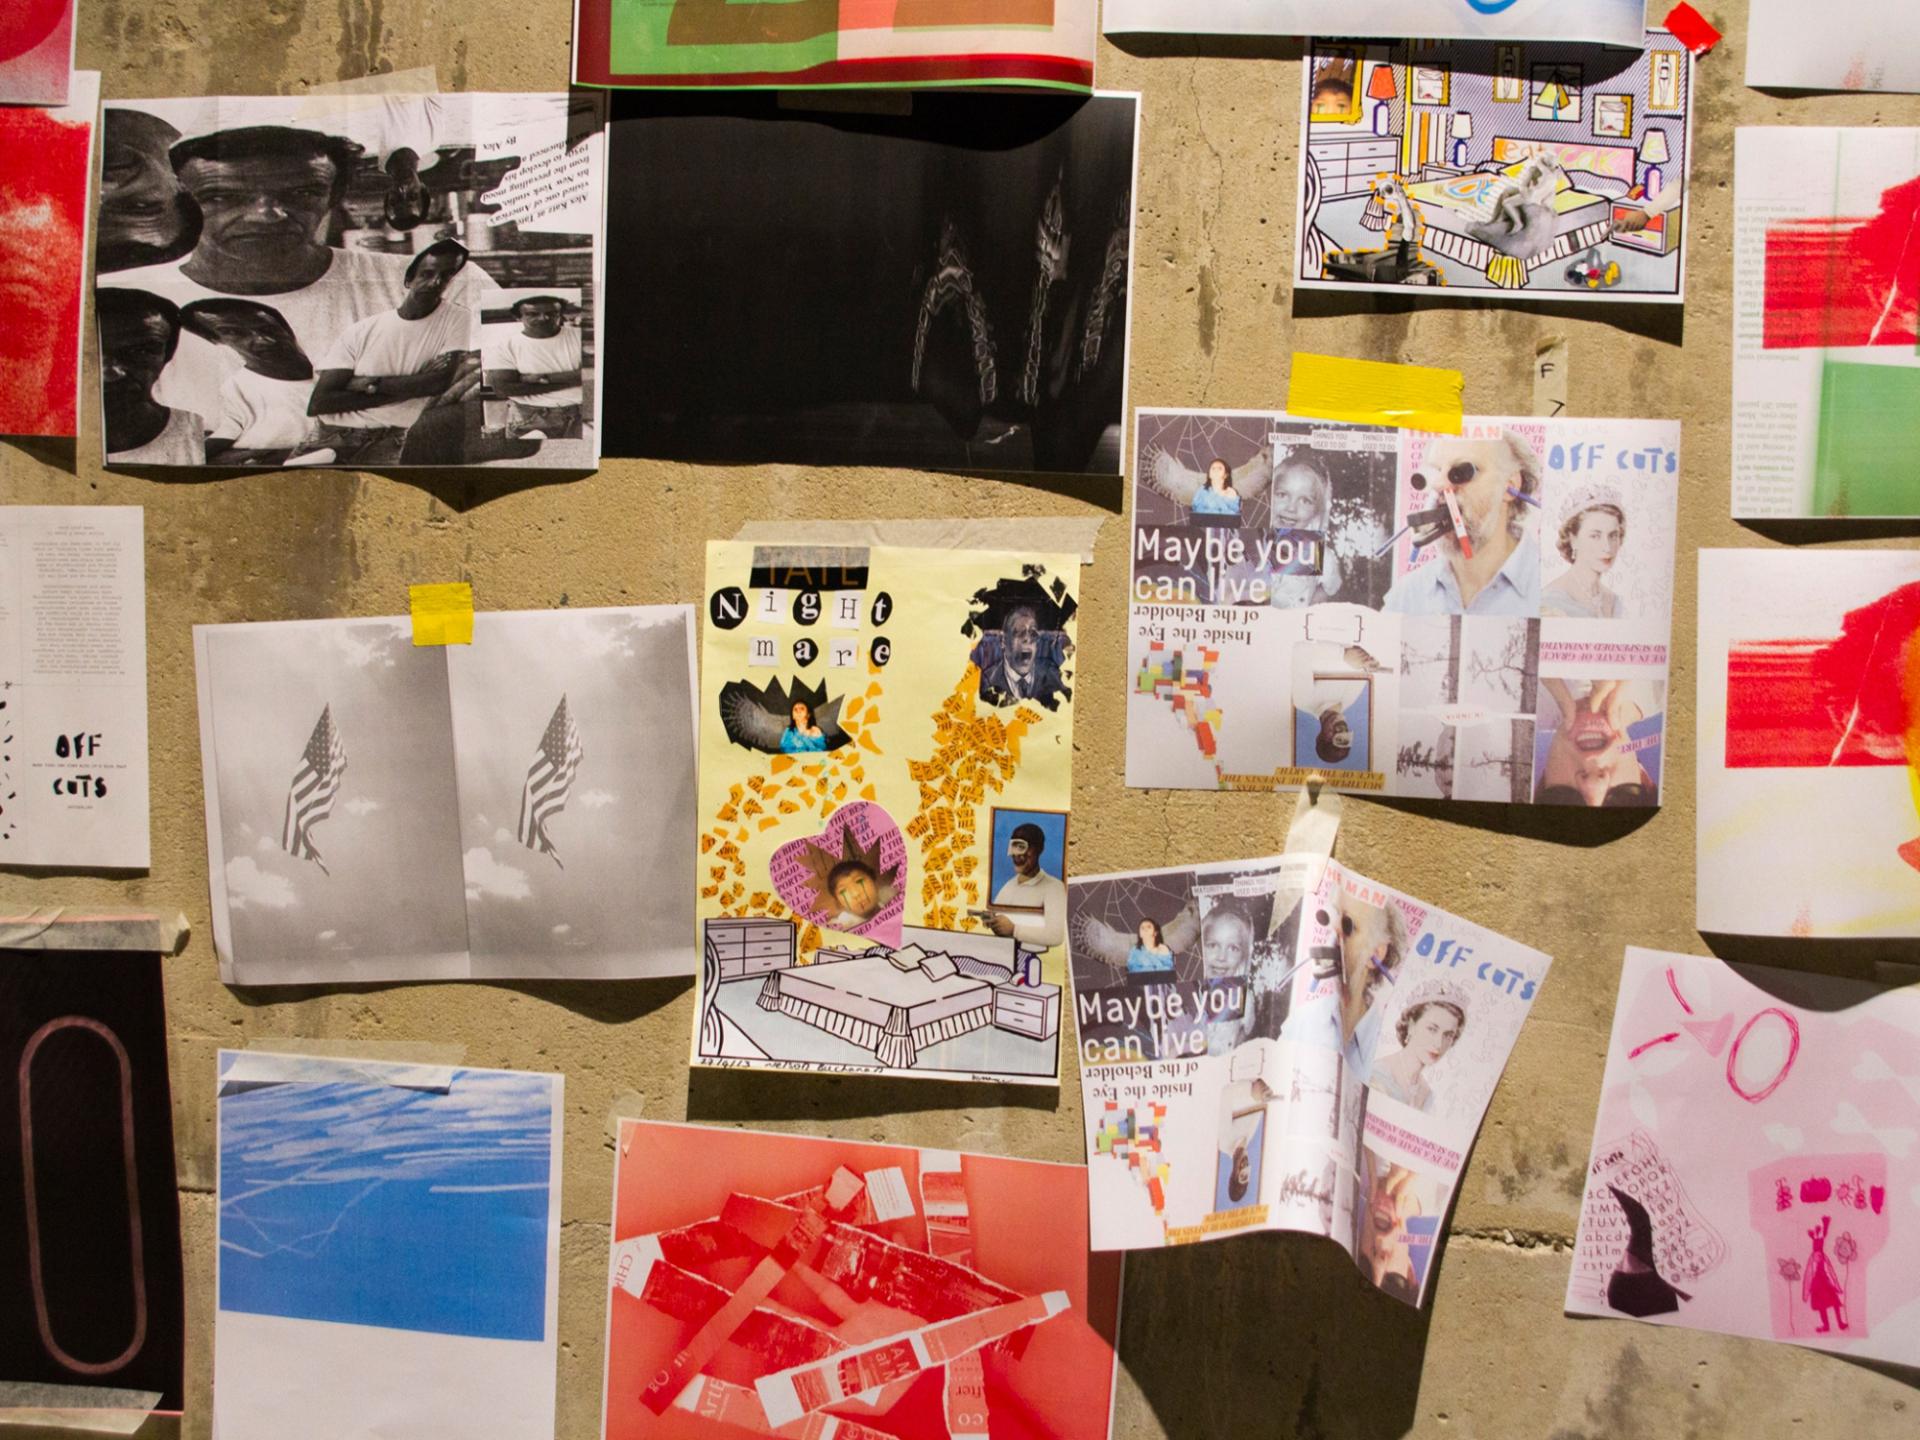 Patrick Fry Studio Tate Modern: Off Cuts